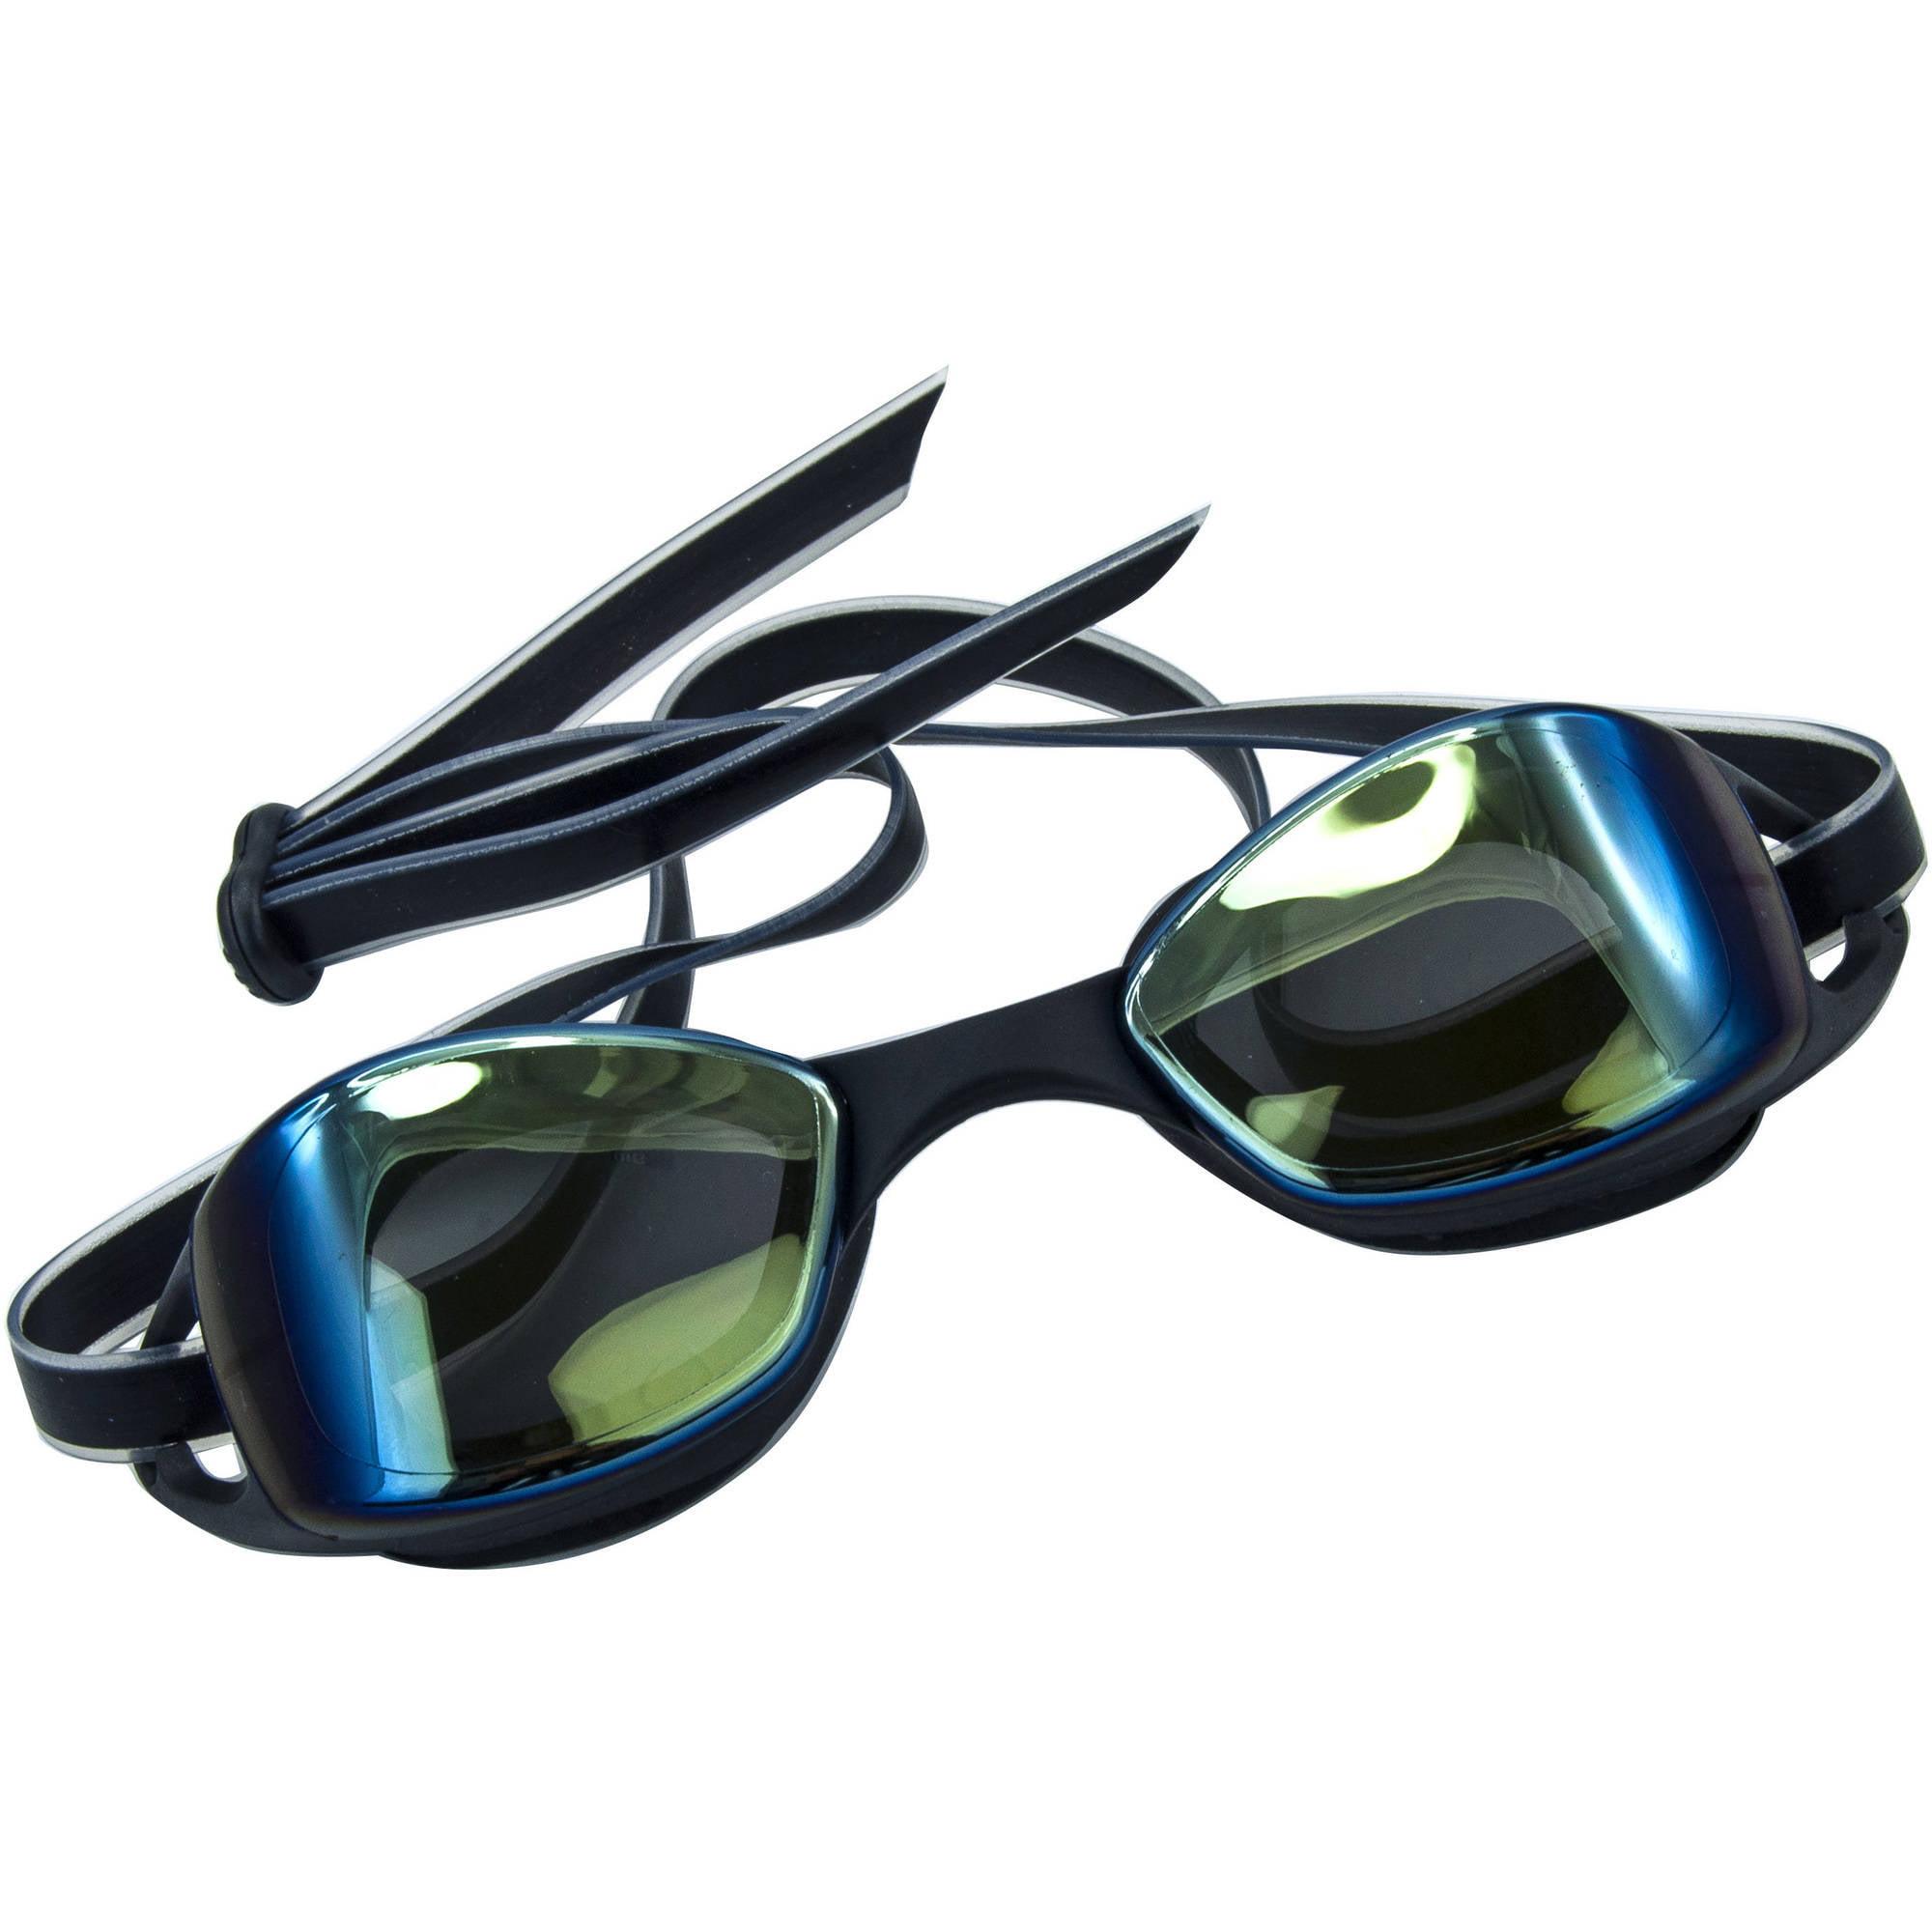 Dolfino Adult Pulse Swim Goggles with Mirrored Lenses, Anti-Fog and UV Protection